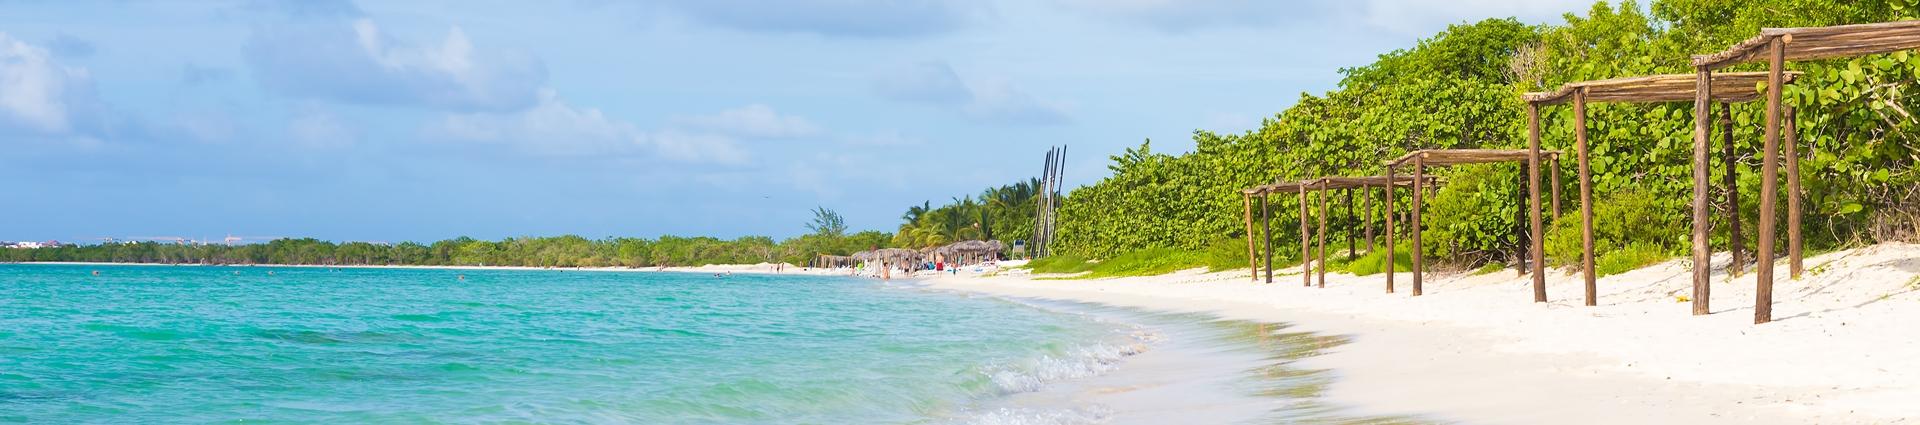 caribe playa